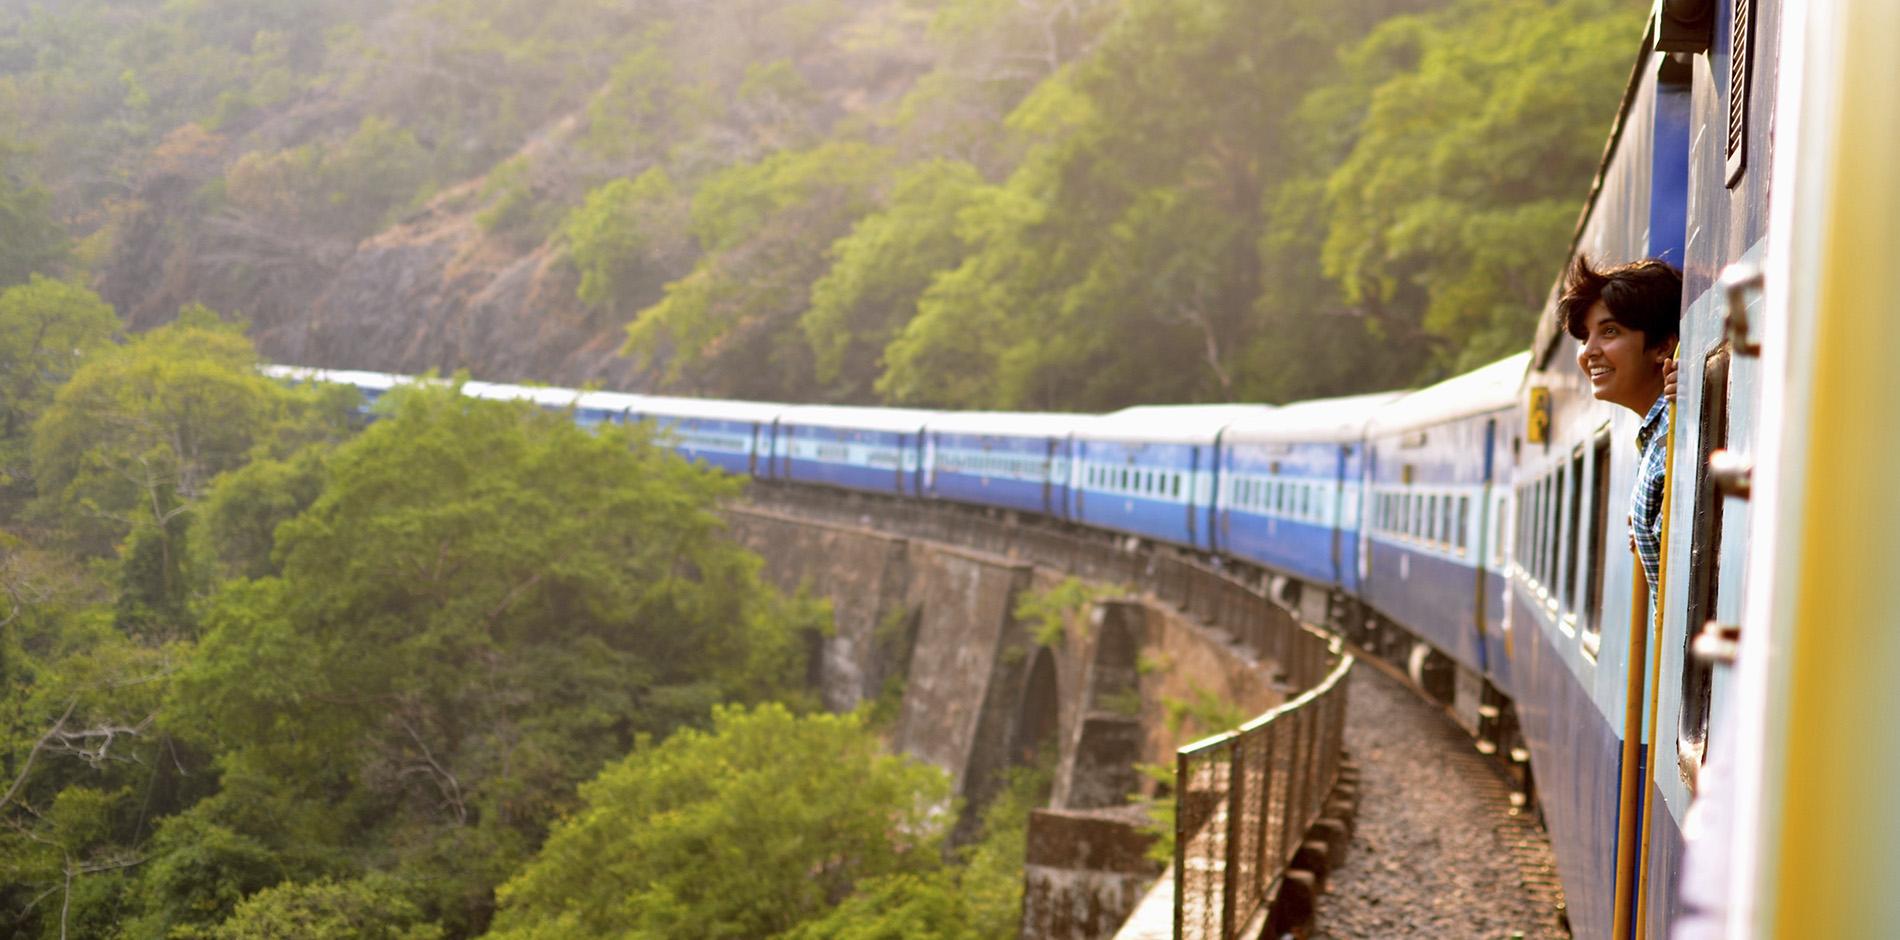 garnica_contrachapado_fireshield_train_3